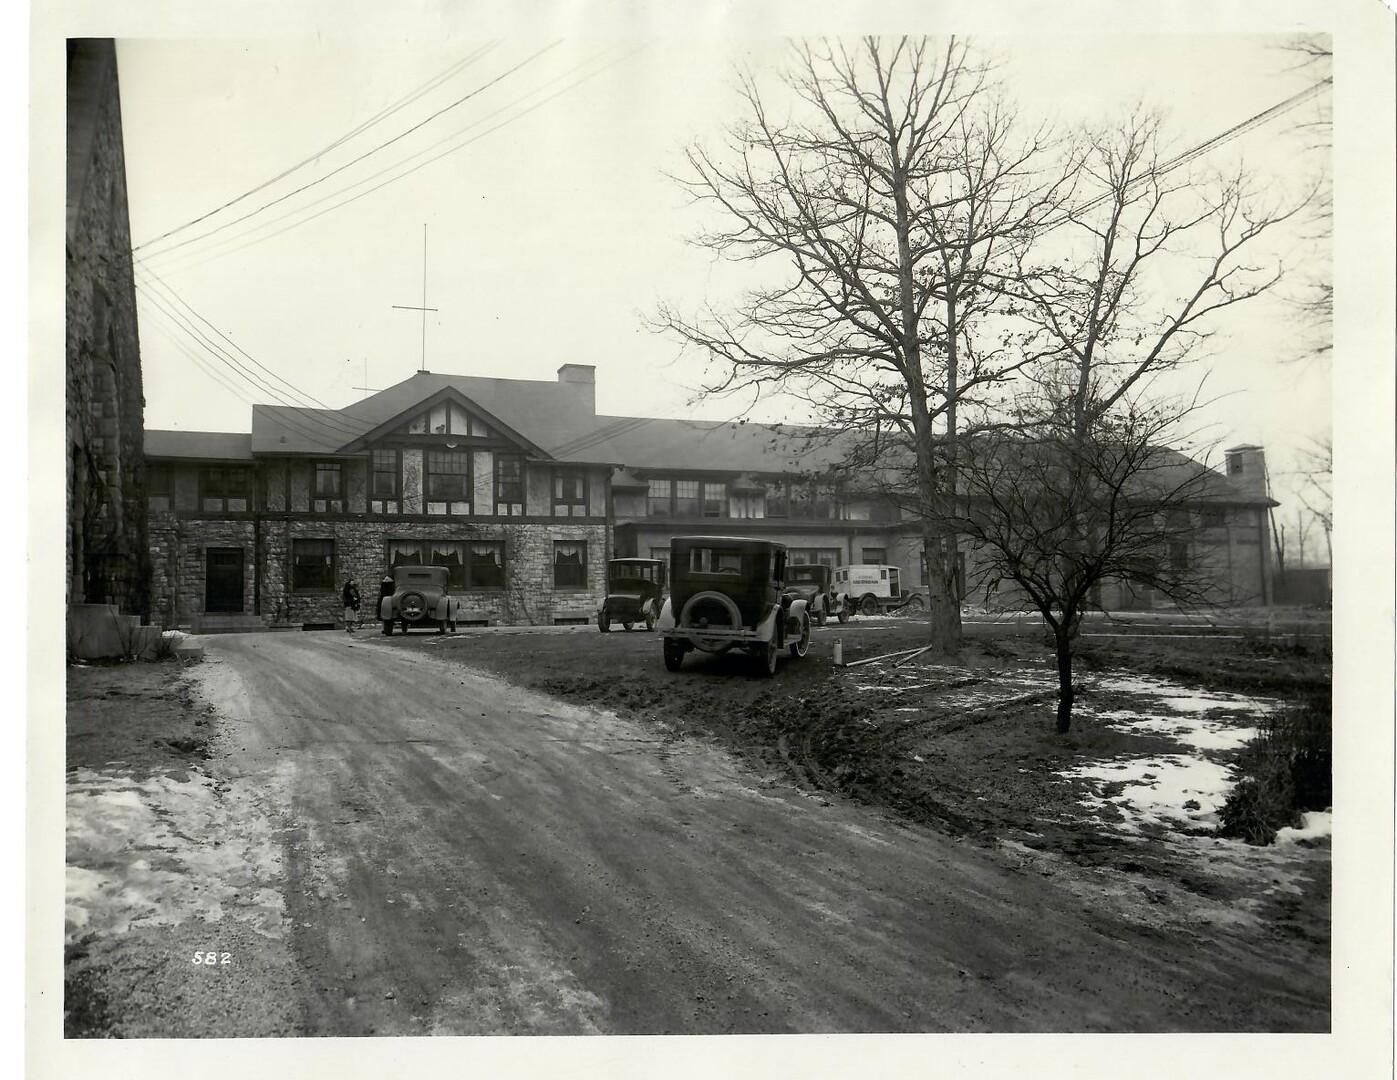 Winnetka Community House circa 1920